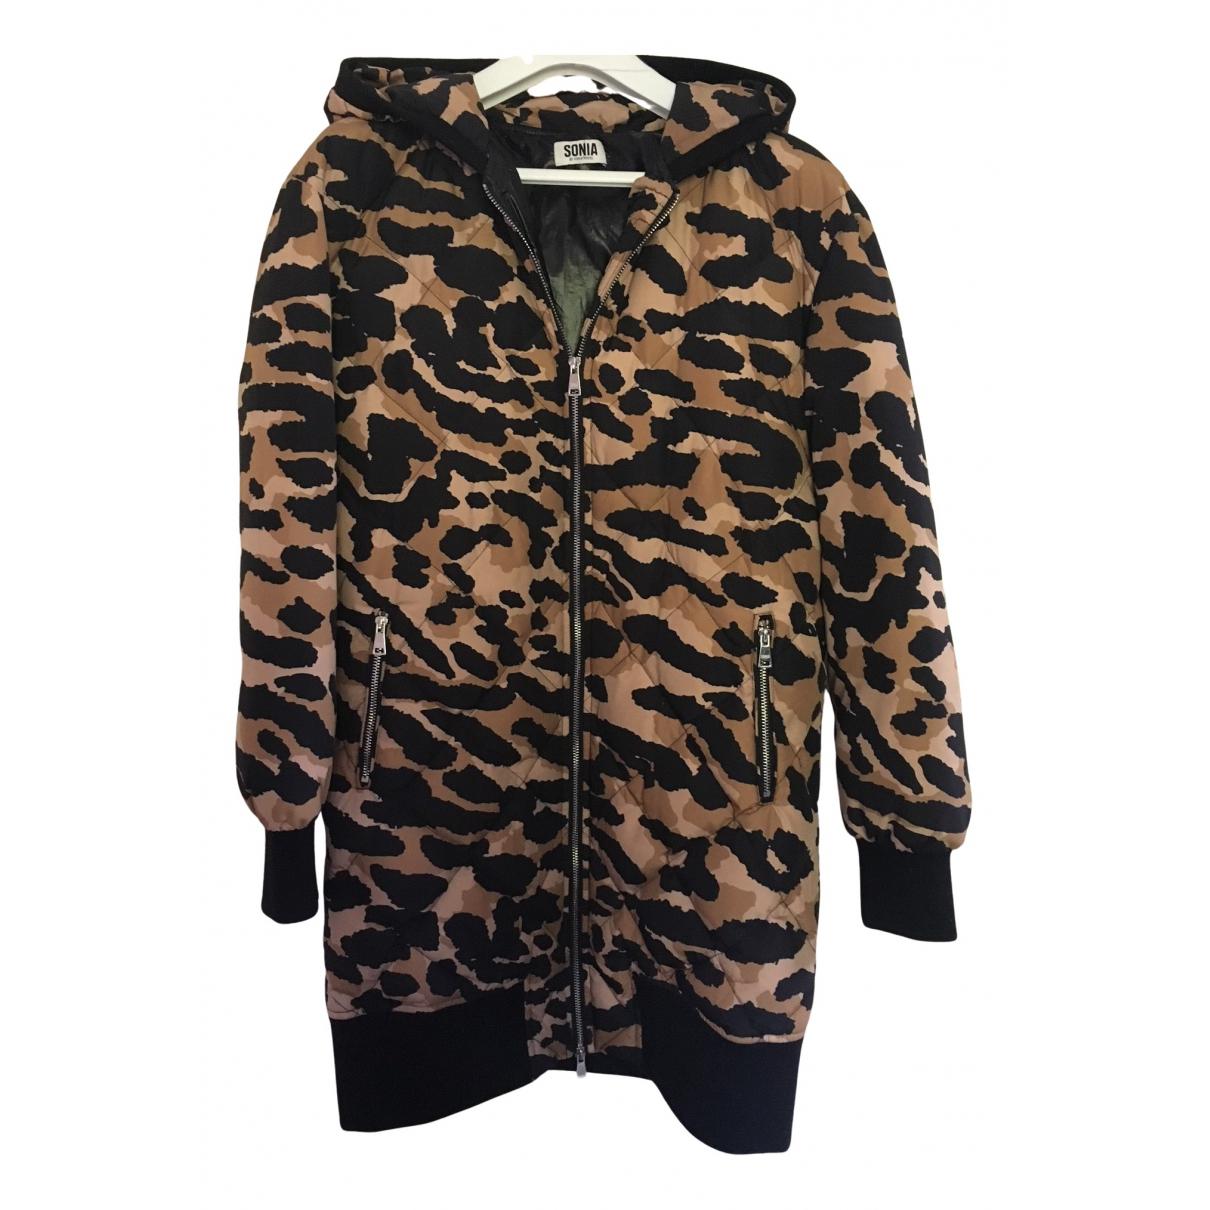 Sonia By Sonia Rykiel N Multicolour coat for Women 40 FR